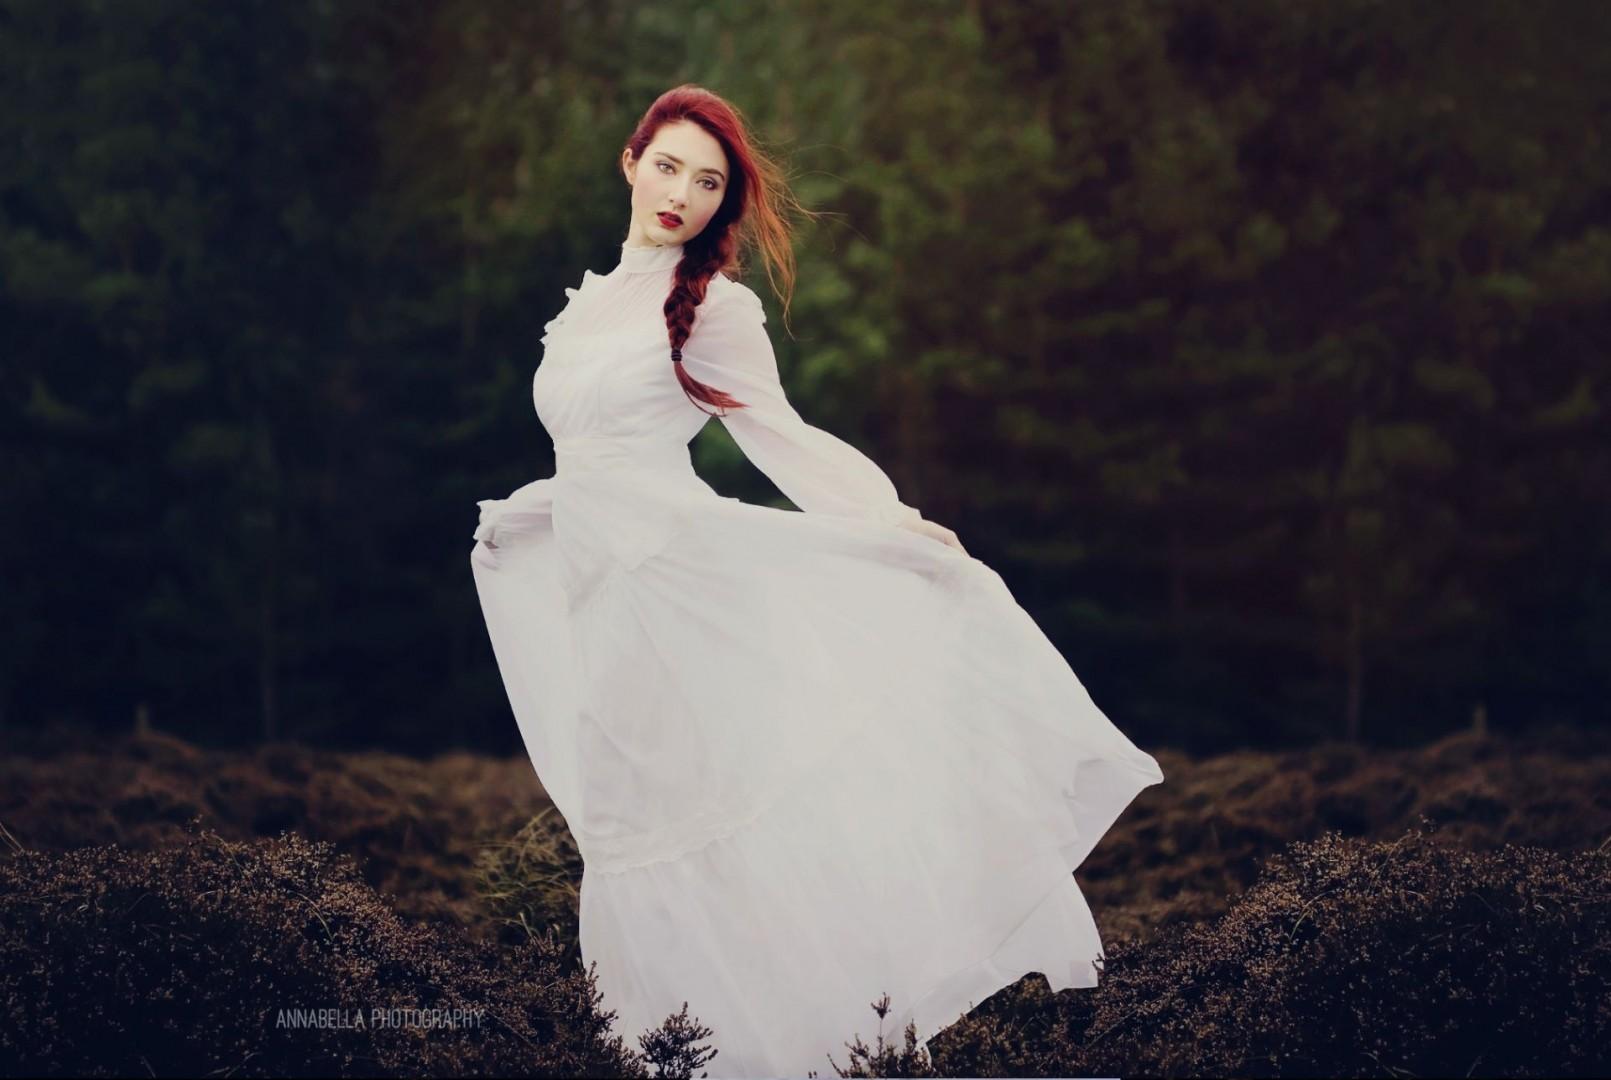 Photographer: Annabella Photography